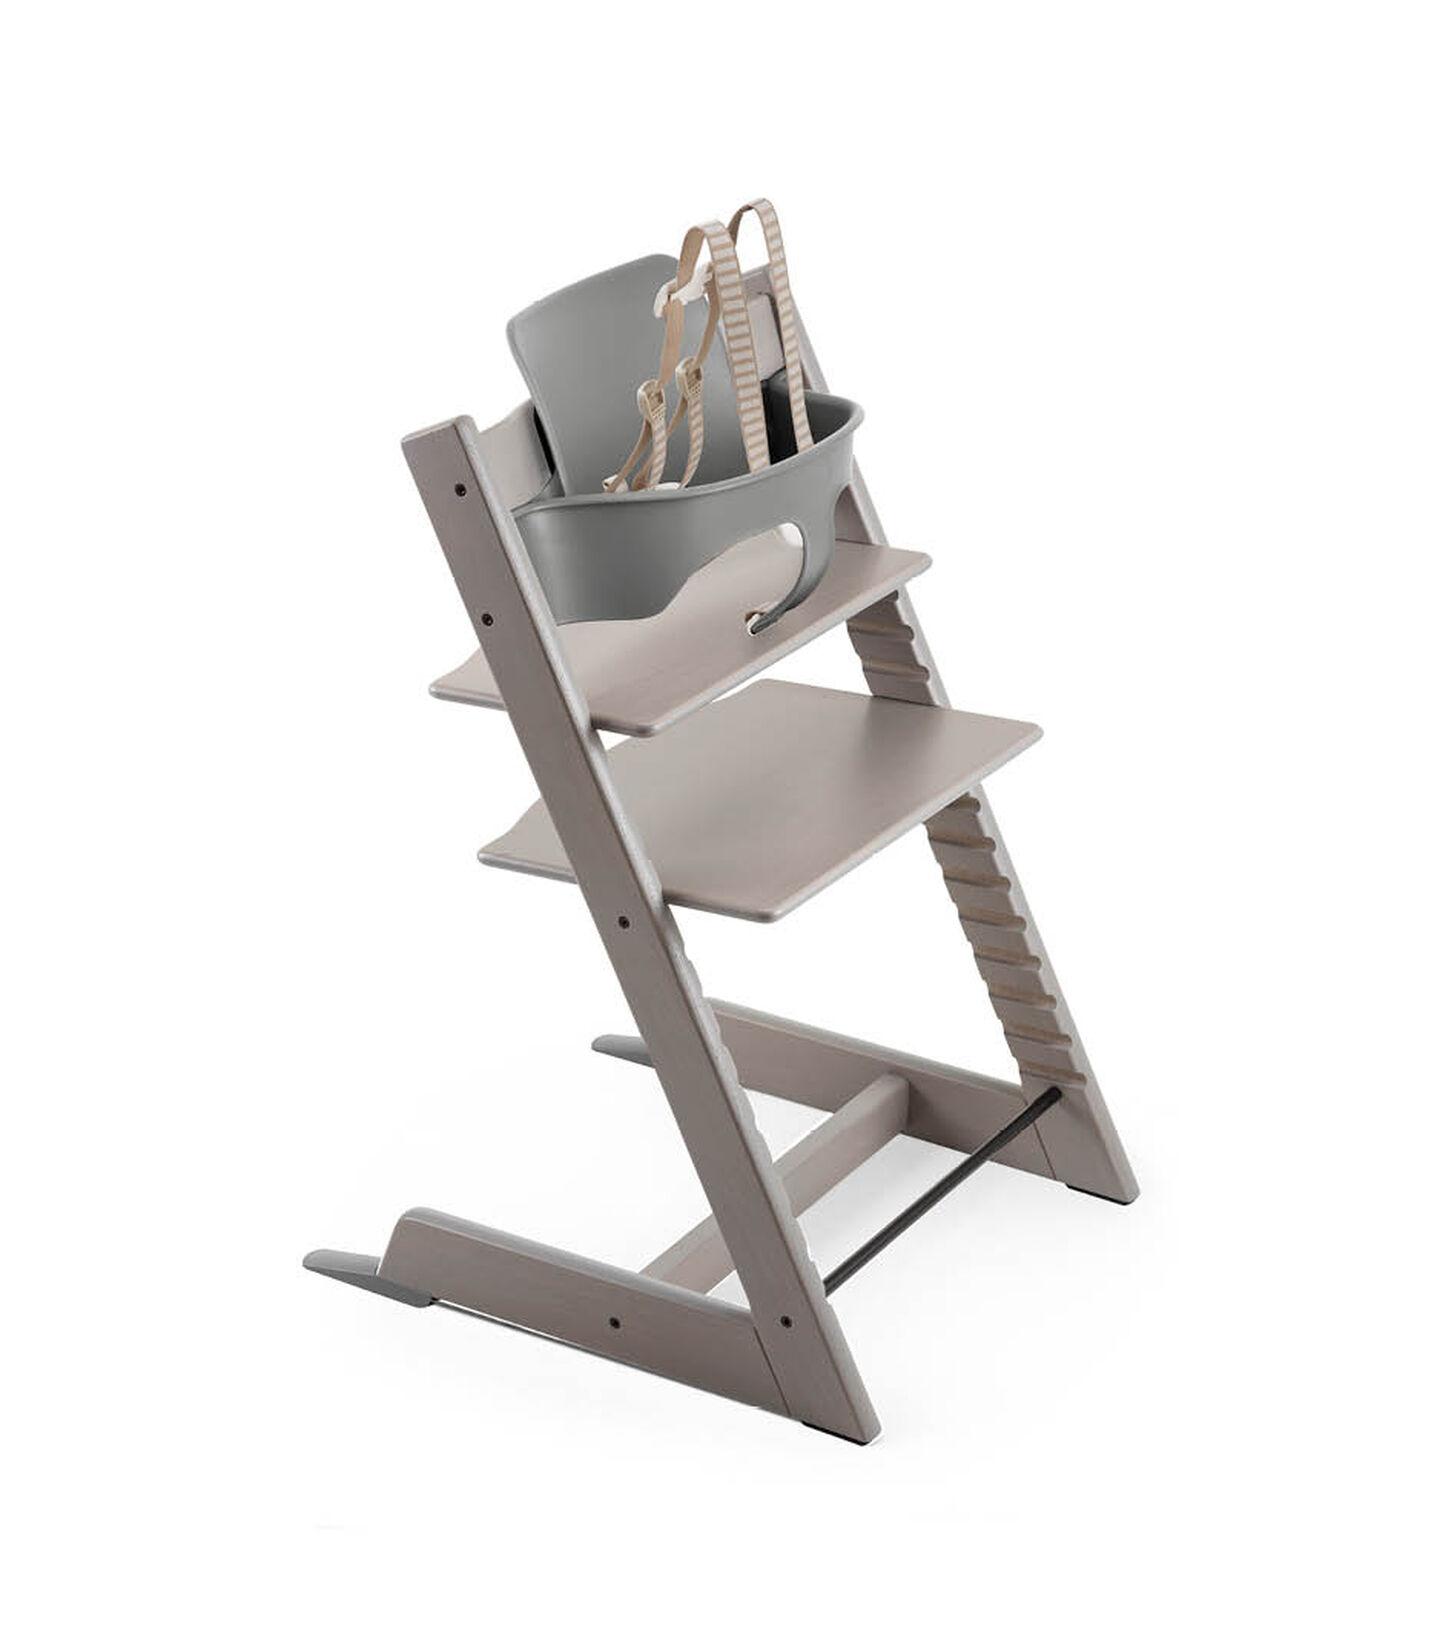 Tripp Trapp® Bundle High Chair US 18 Oak Greywash, Oak Greywash, mainview view 1